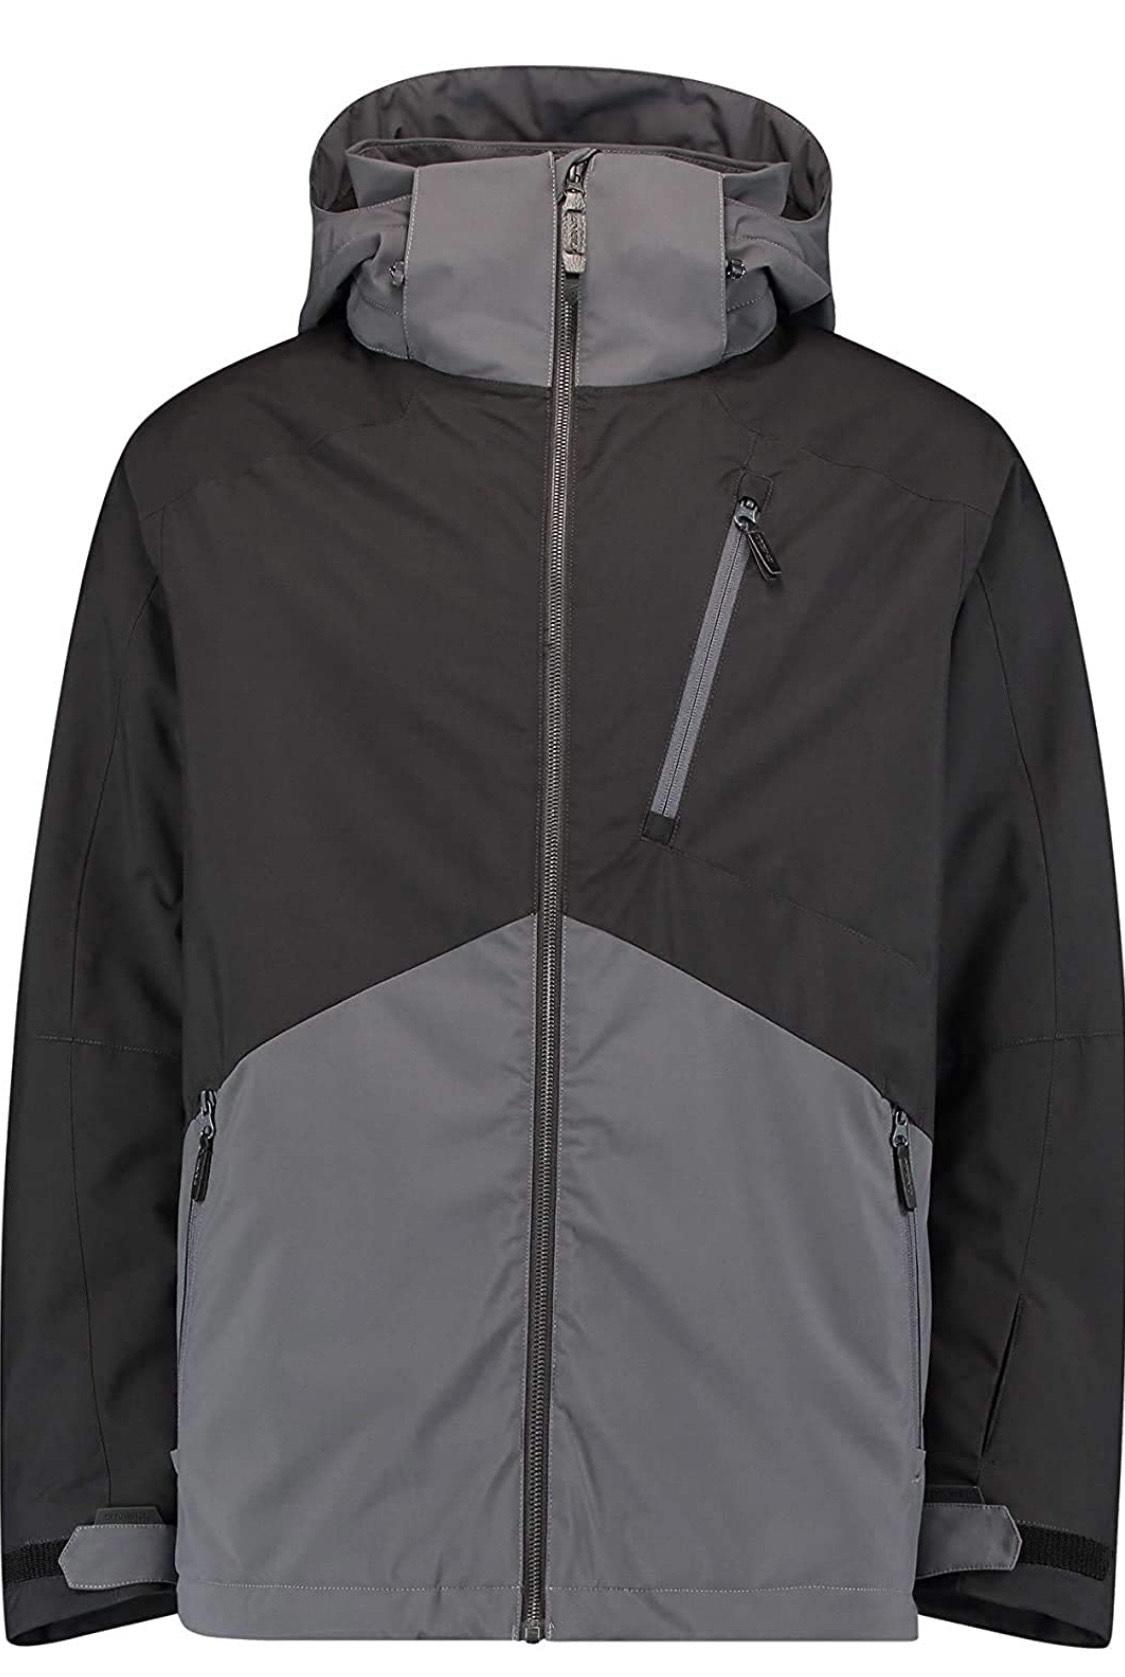 Tamaño: XL Color: black out O'NEILL Nieve Hombre